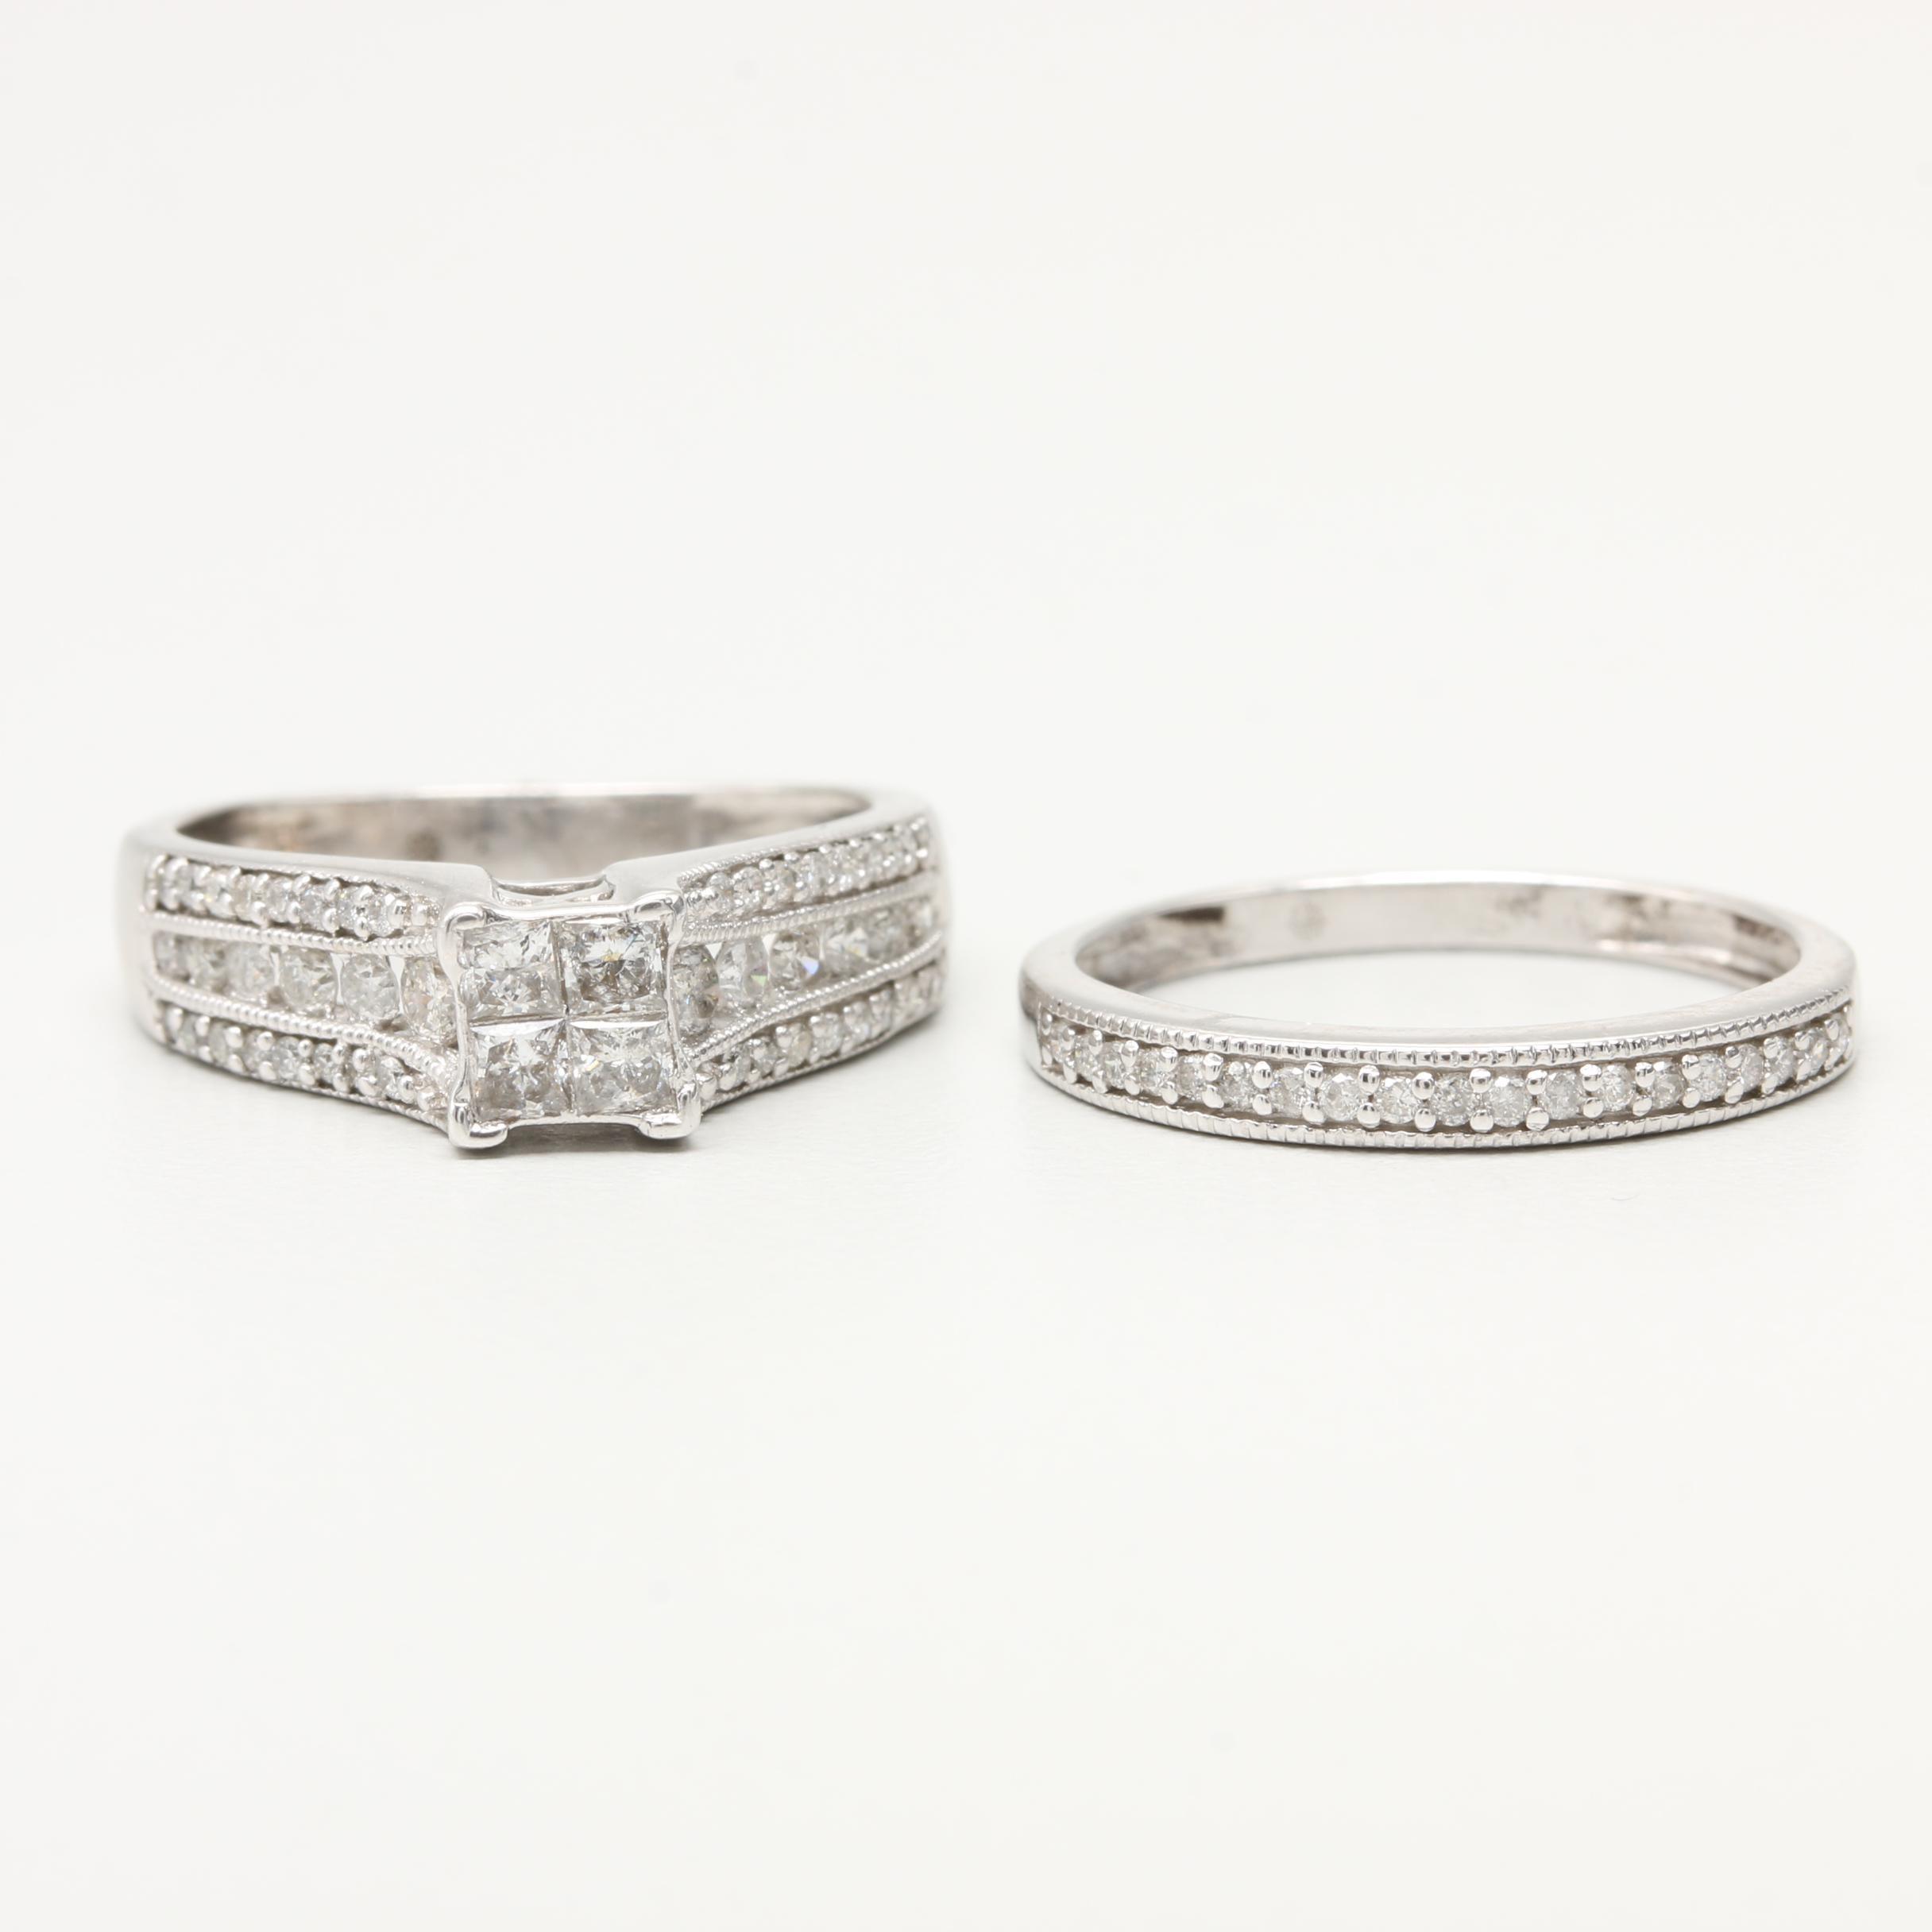 14K White Gold Diamond Ring Set